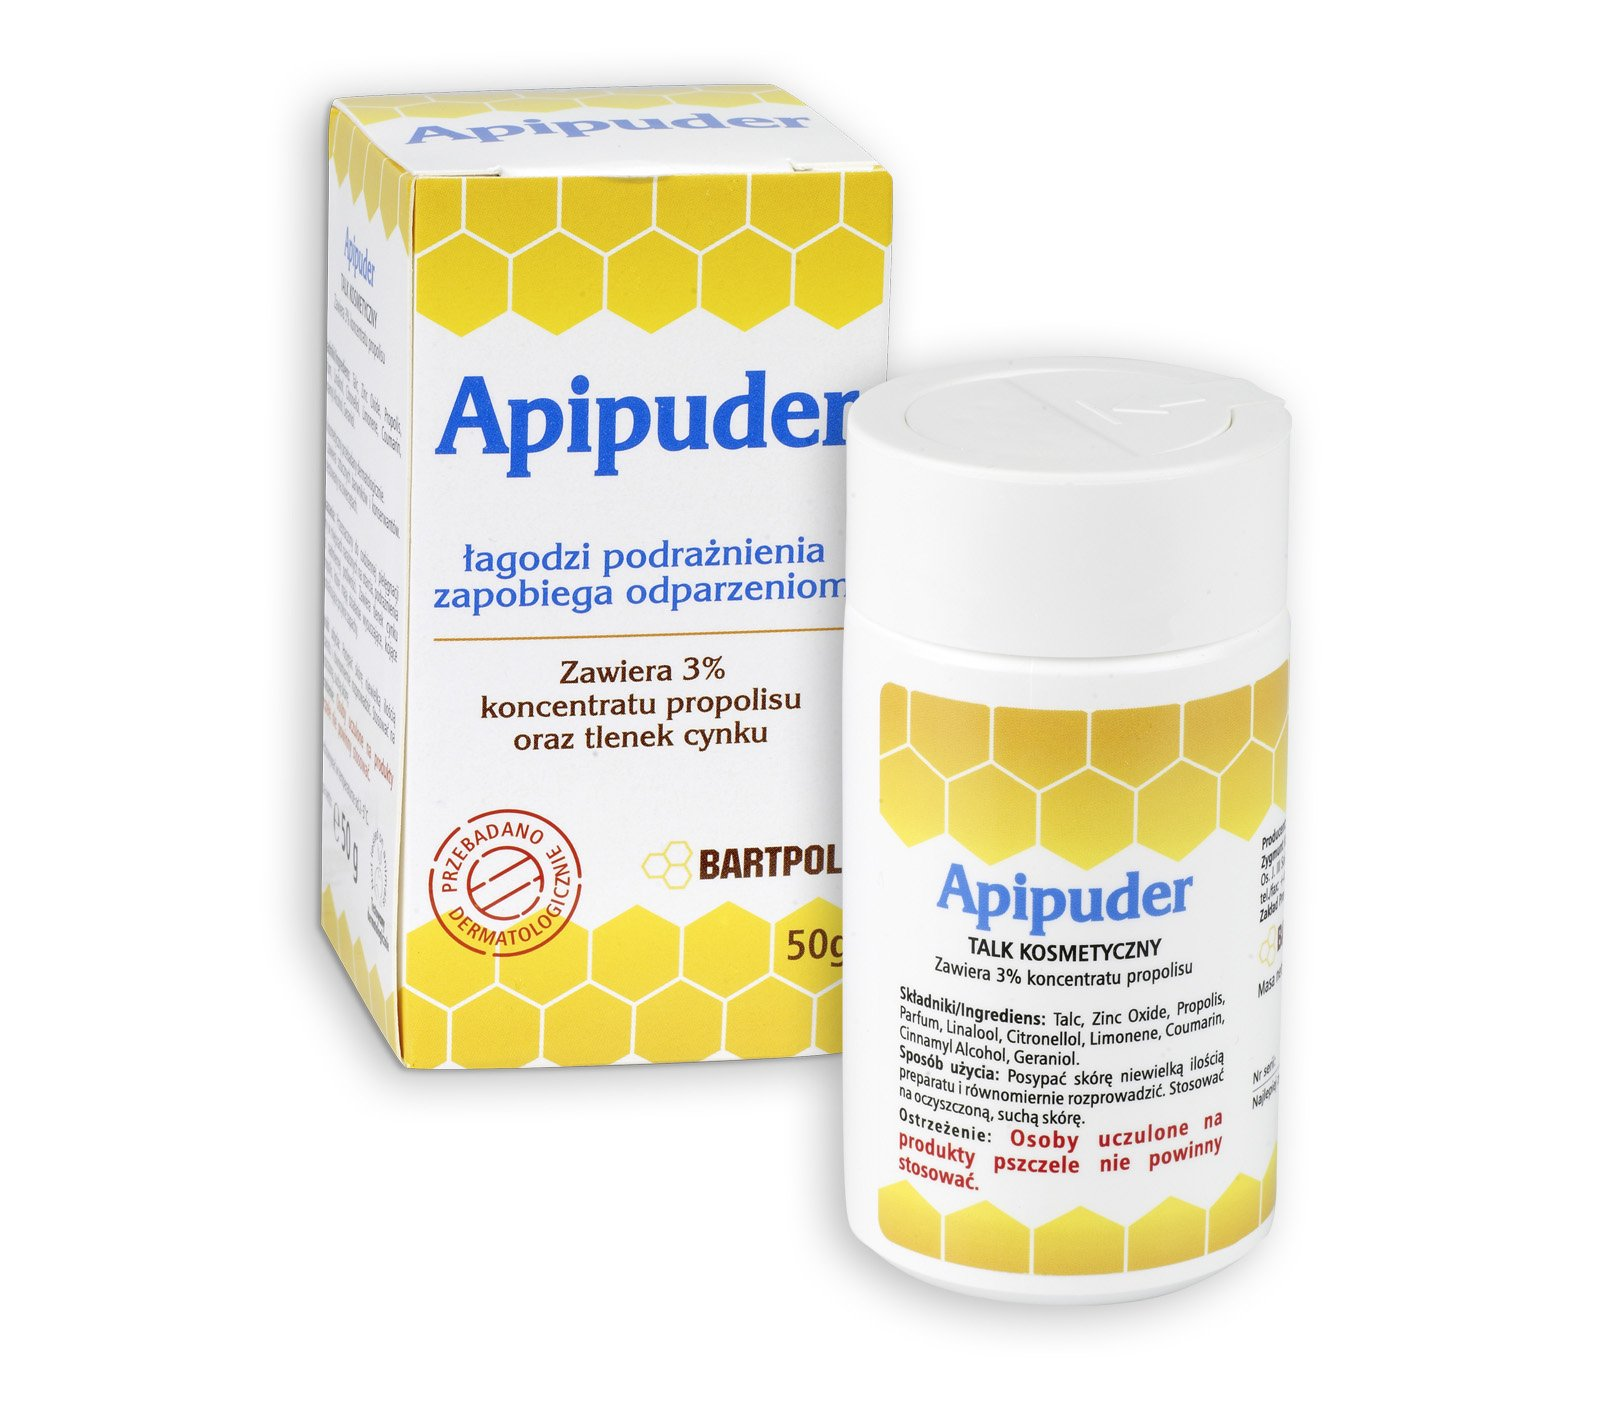 APIPUDER - Propolis Dermatologist Talk for external use 50 g